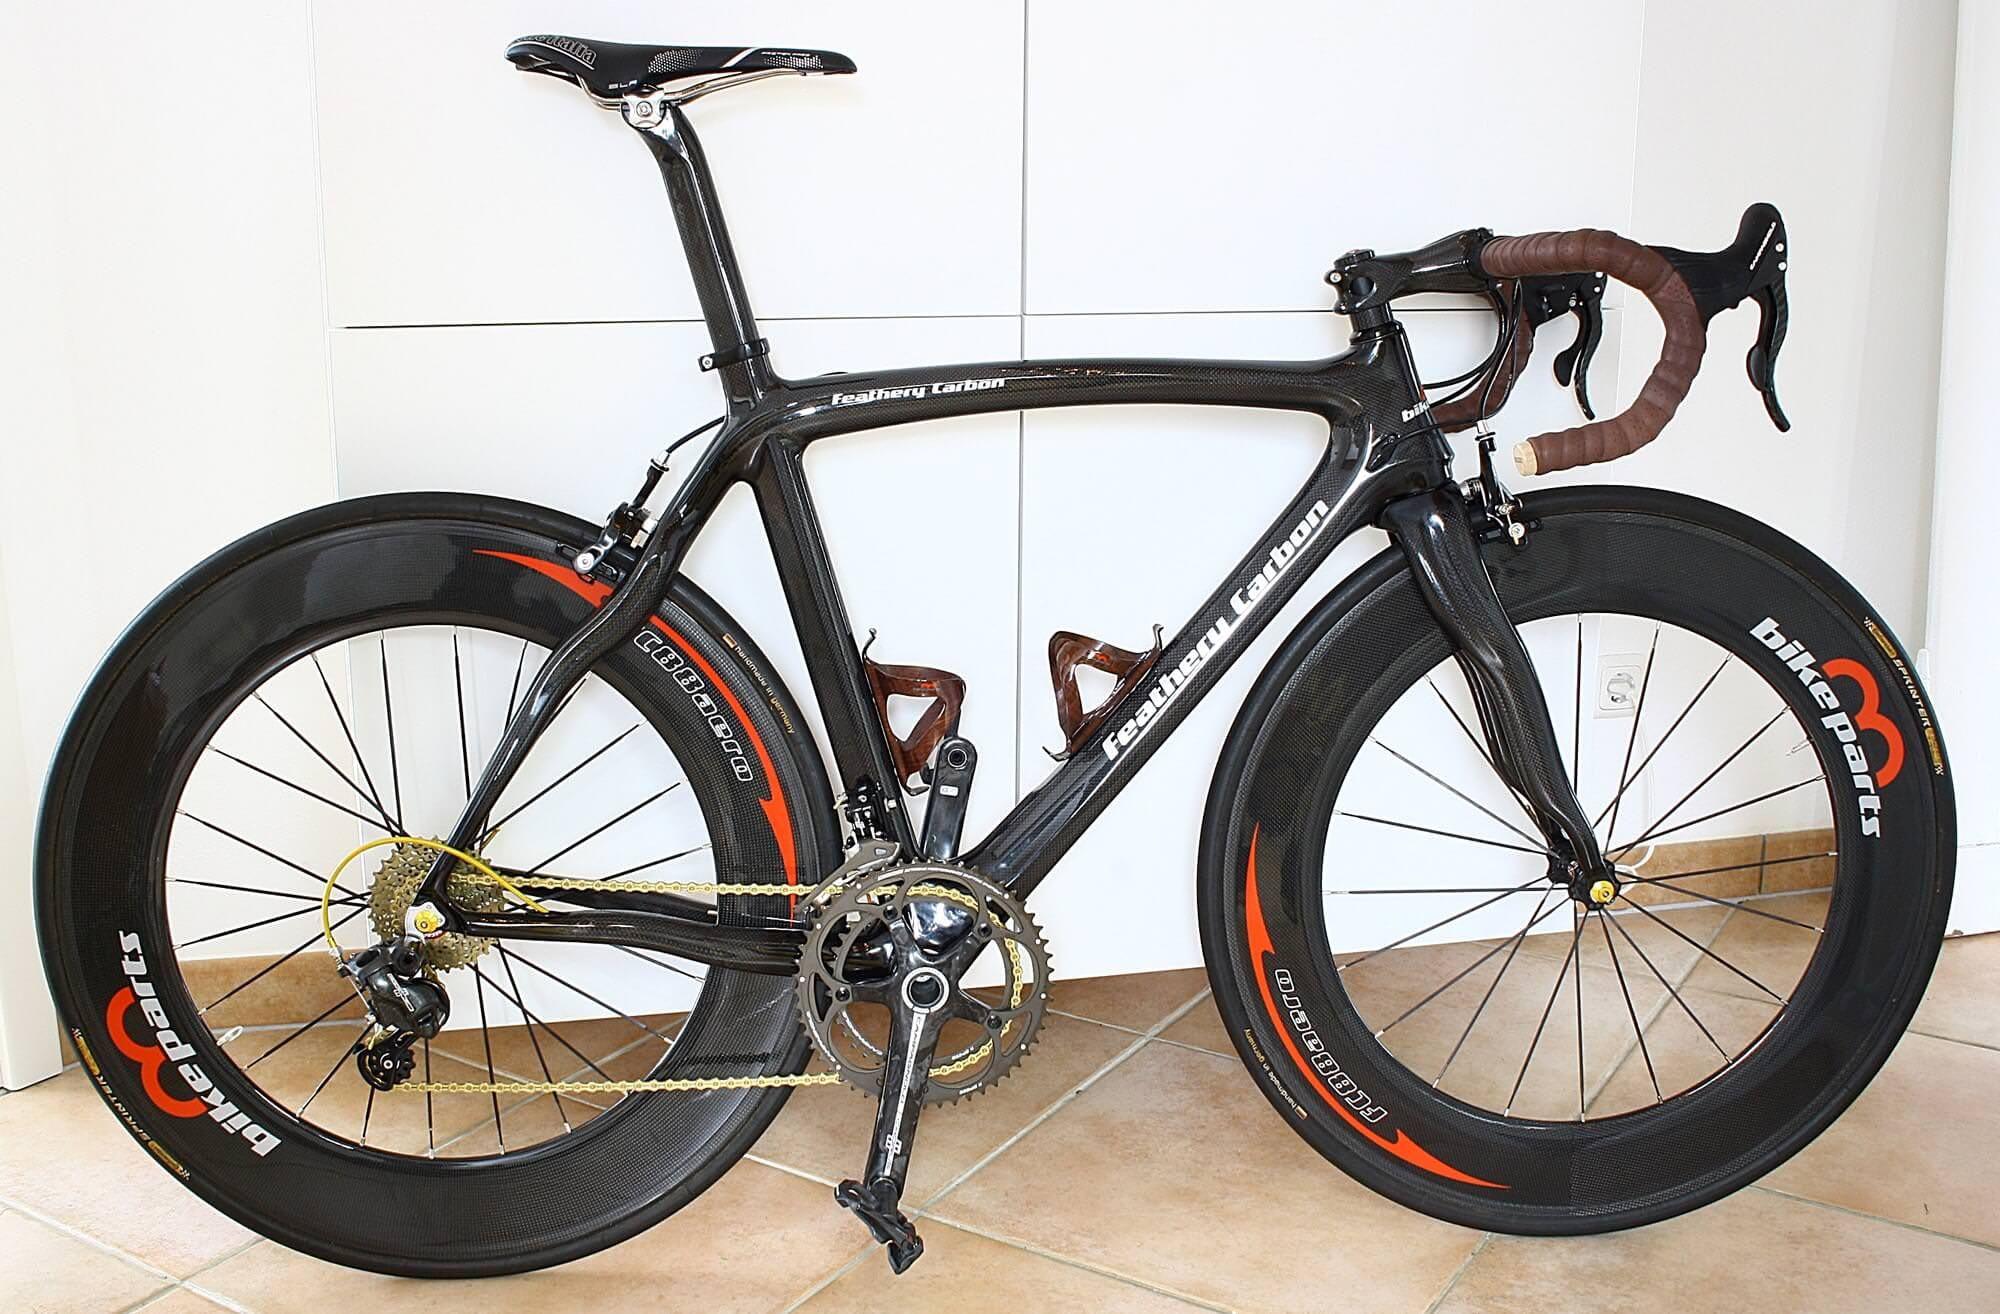 Feathery Carbon Rennrad Rahmen, Gabel und Sattelstütze 54cm, 3k klar ...